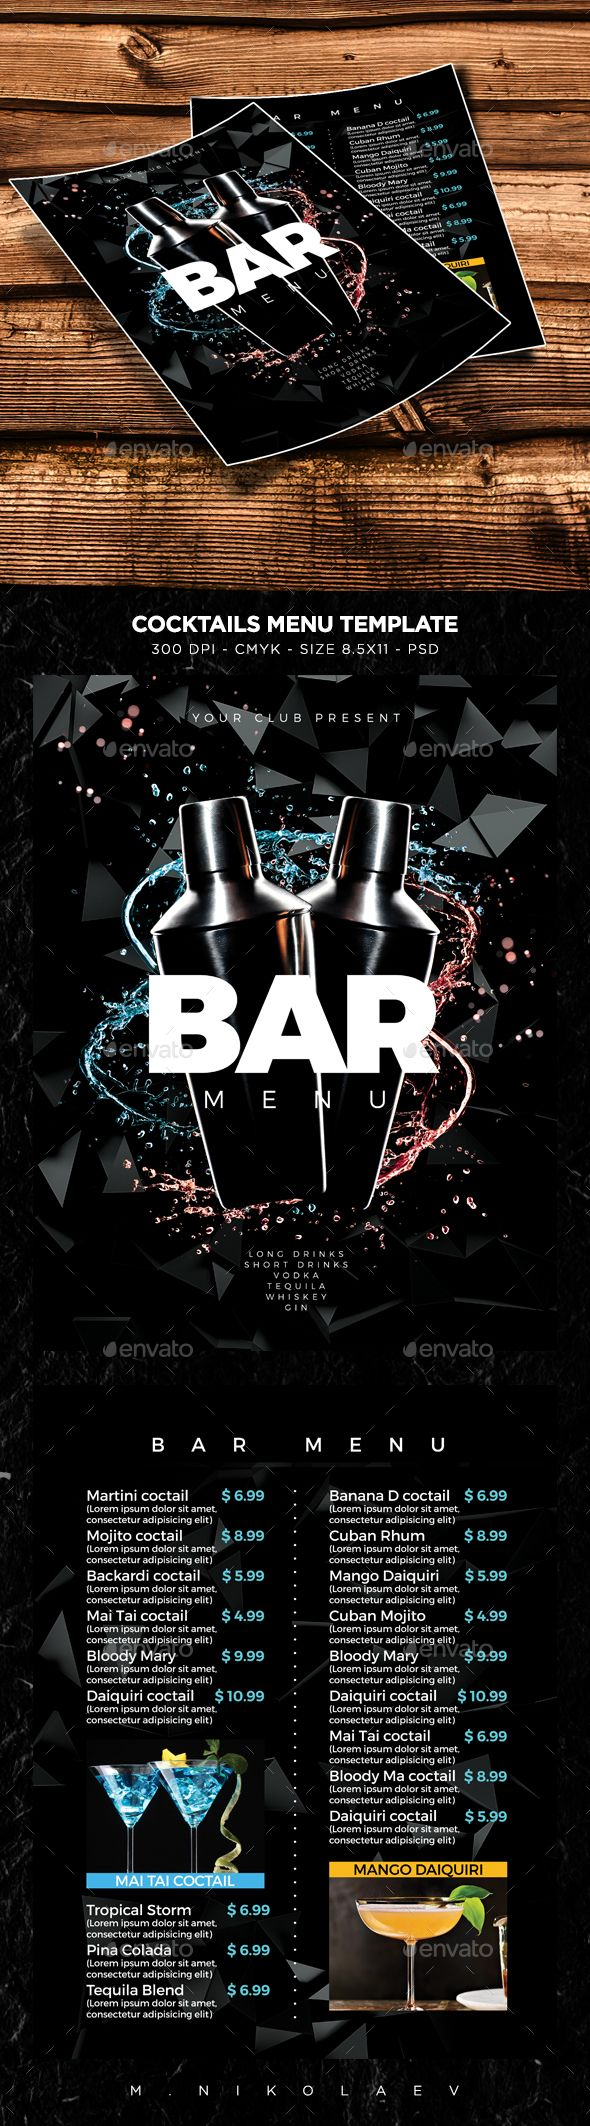 Cocktail Drinks Menu Template PSD. Download here: https://graphicriver.net/item/cocktail-drinks-menu-v10/17020805?ref=ksioks